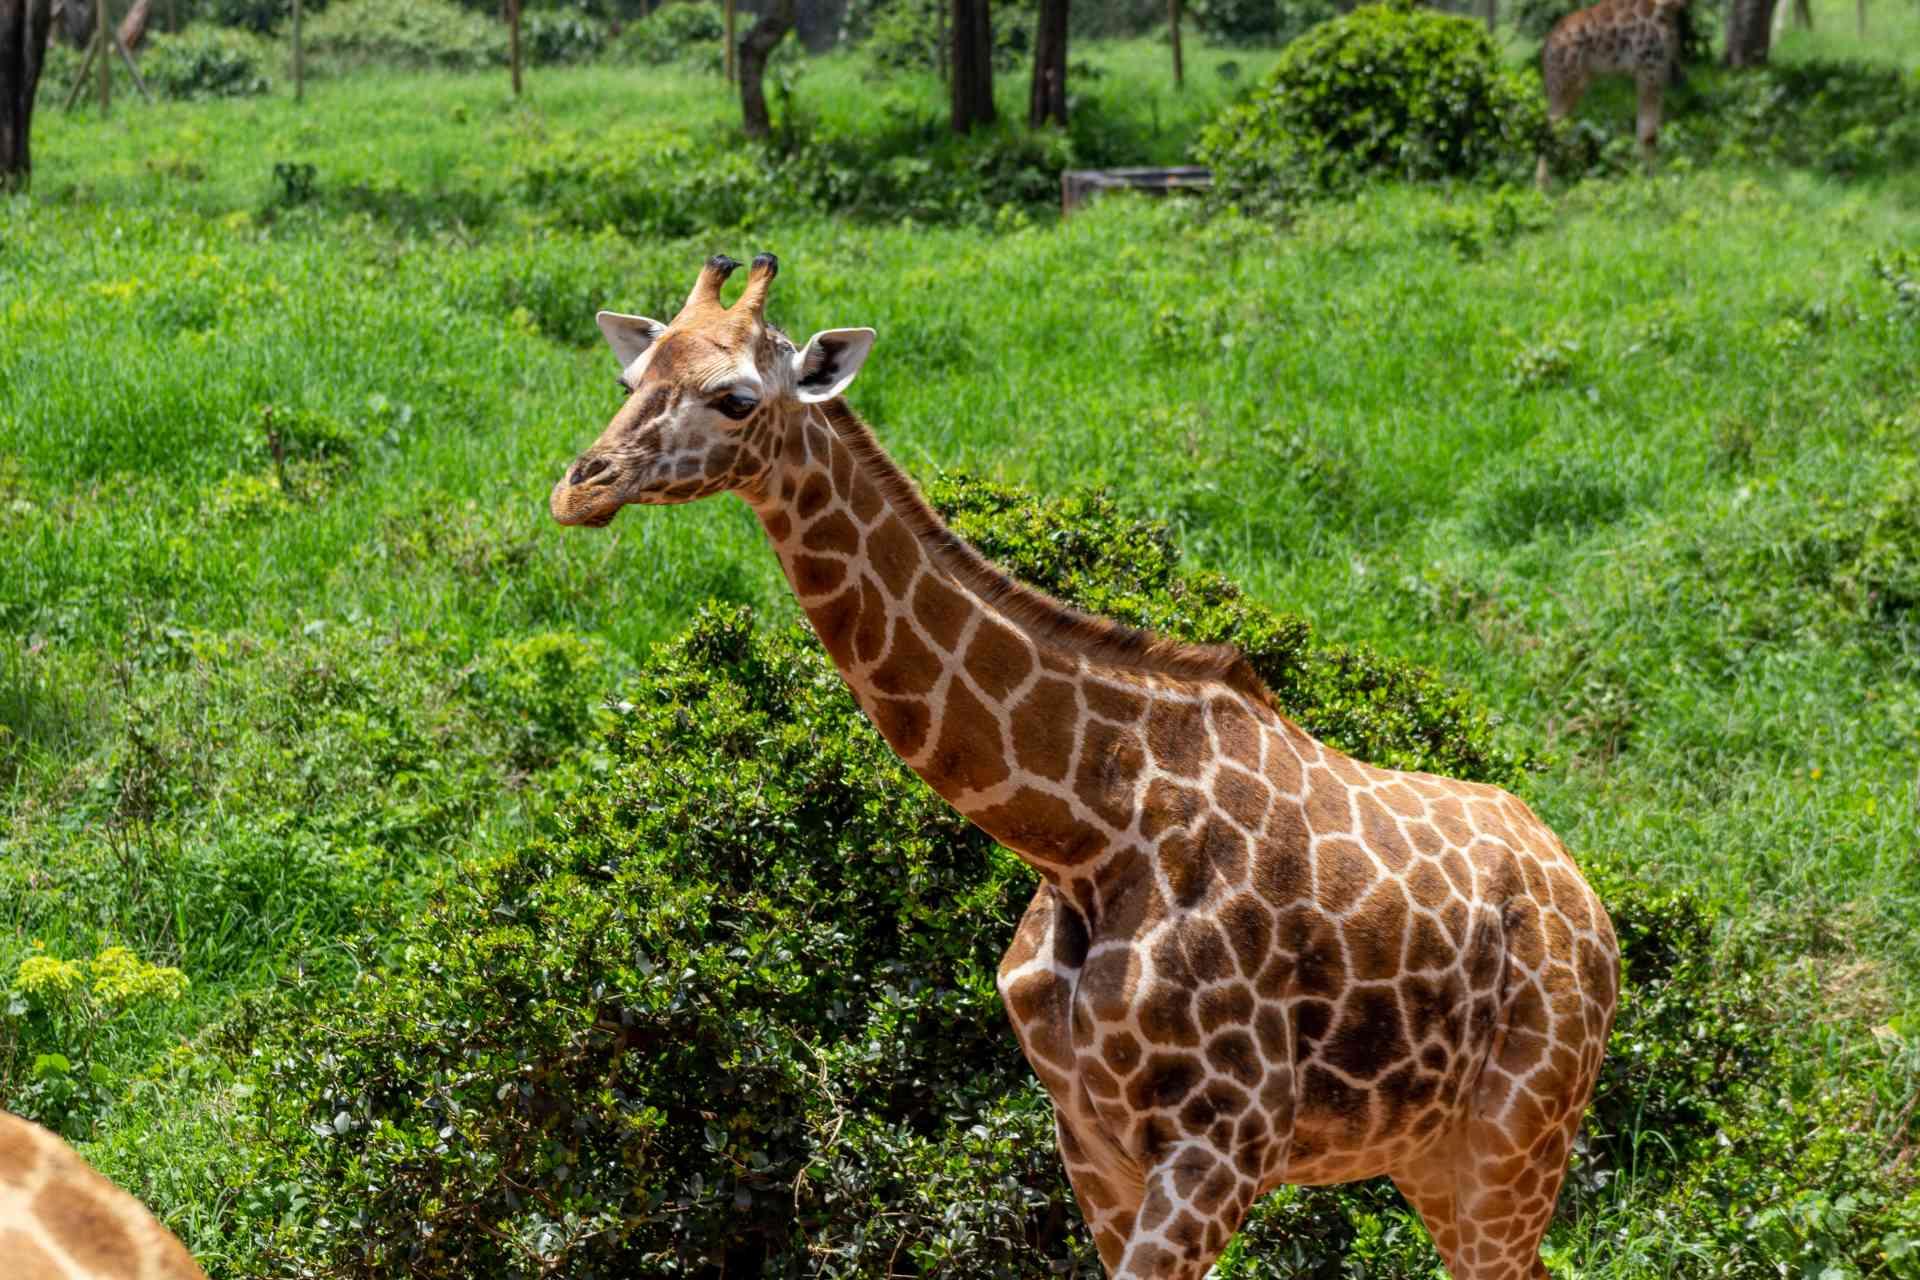 Giraffe Centre, Nairobi, Kenya by Chloe Marshman